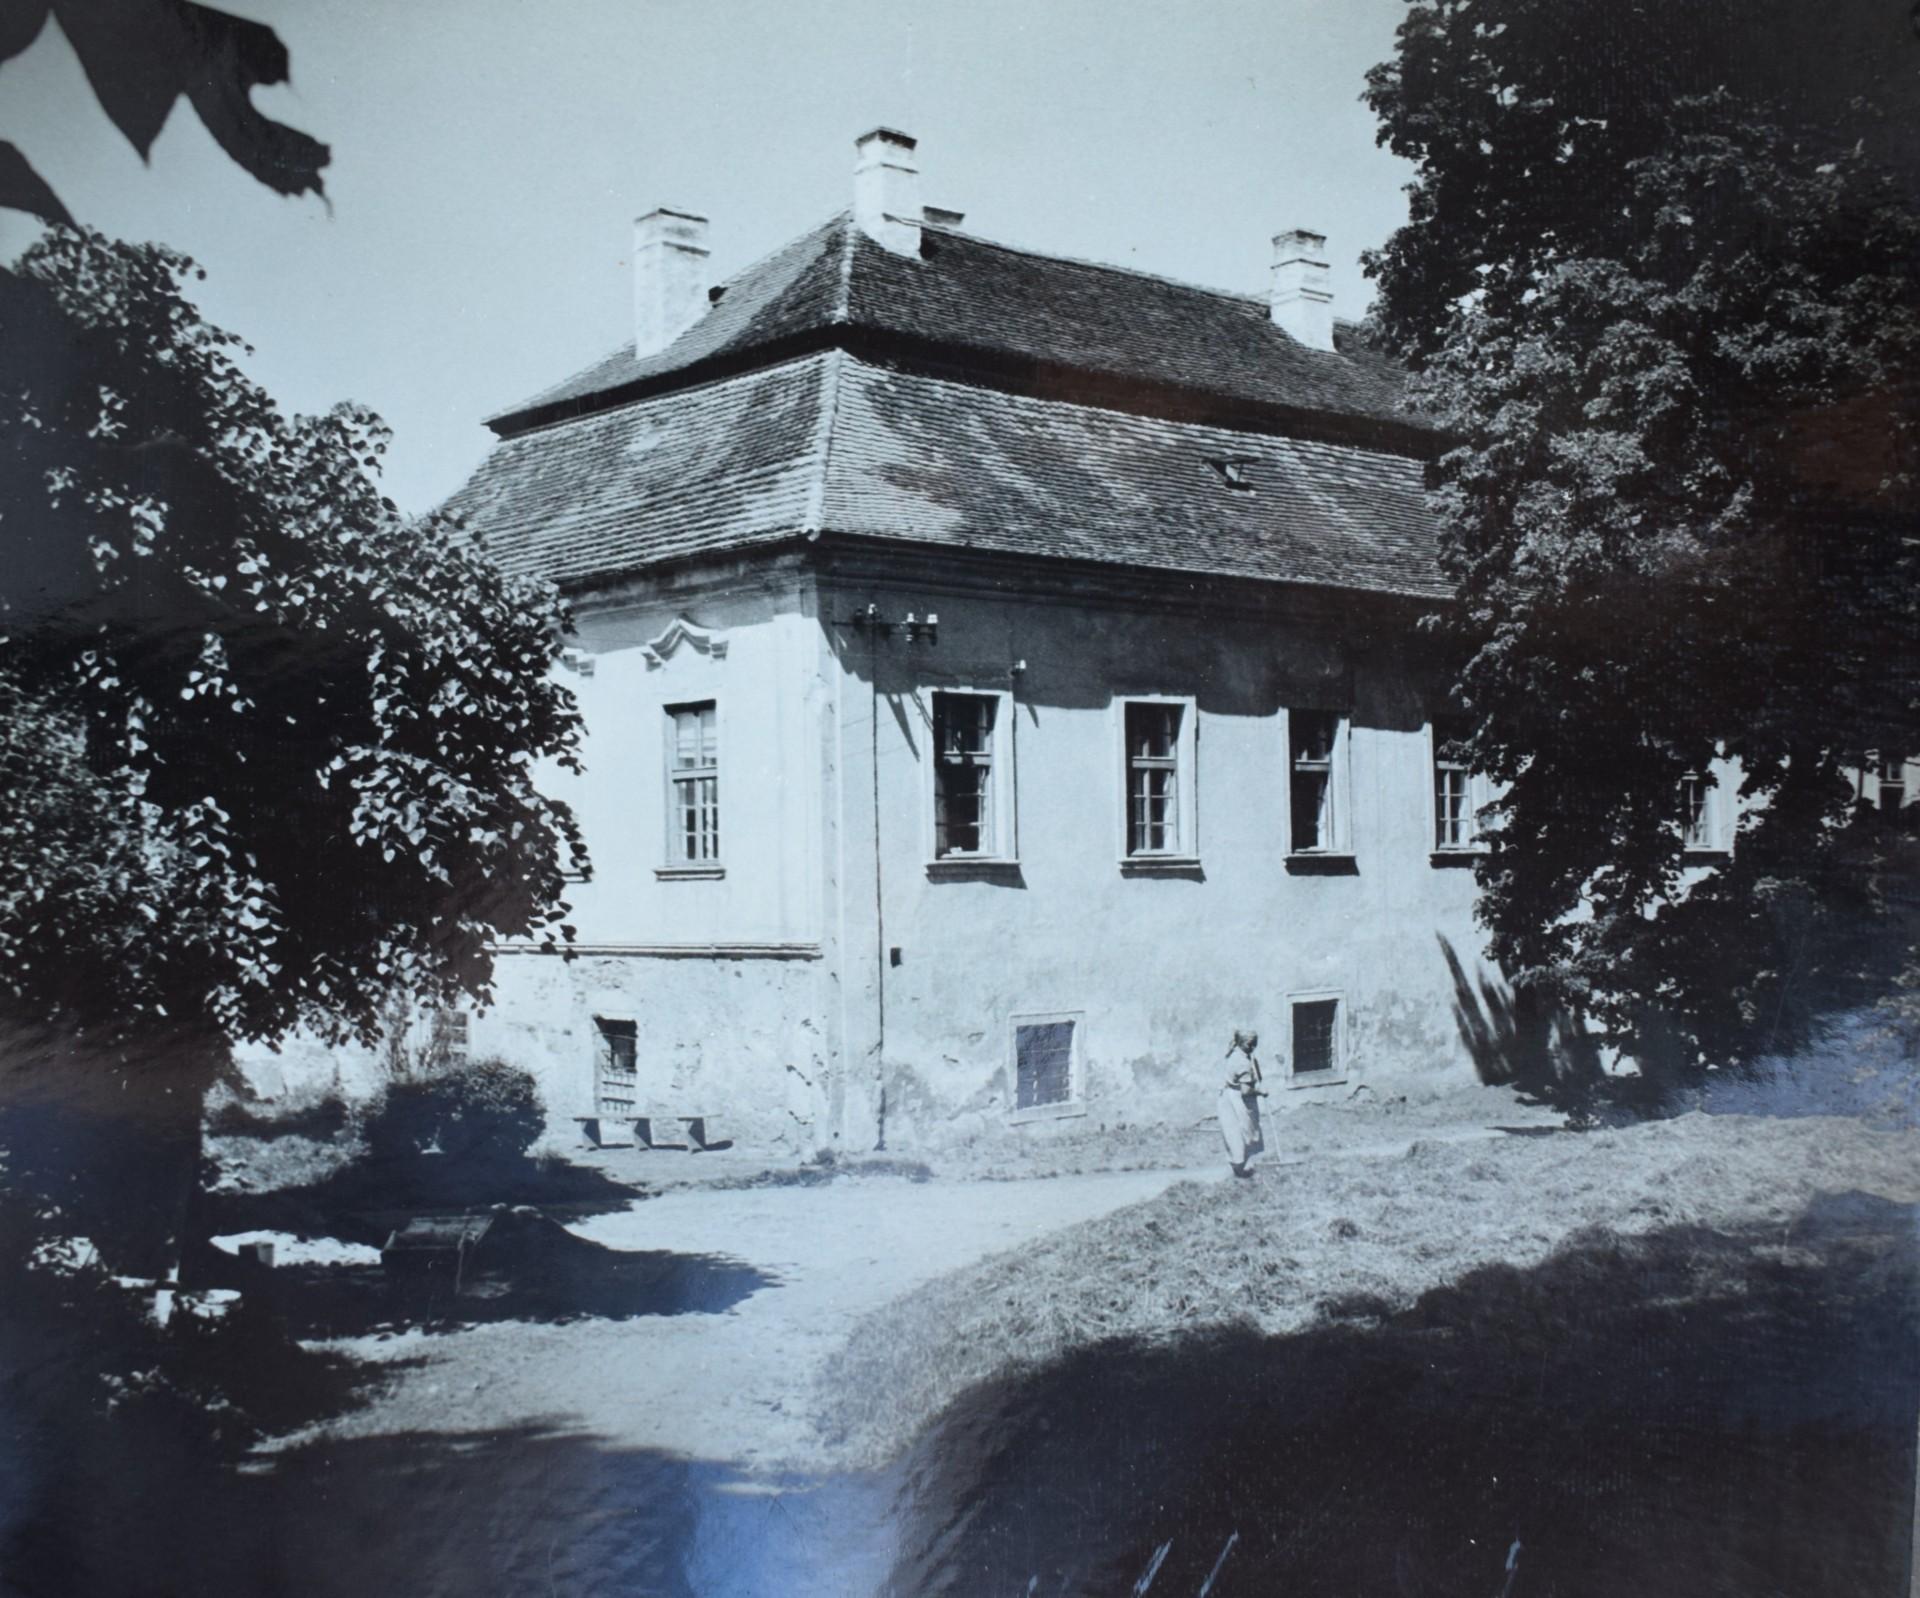 Denisa Strmiskova Studio NAČERADEC CASTLE